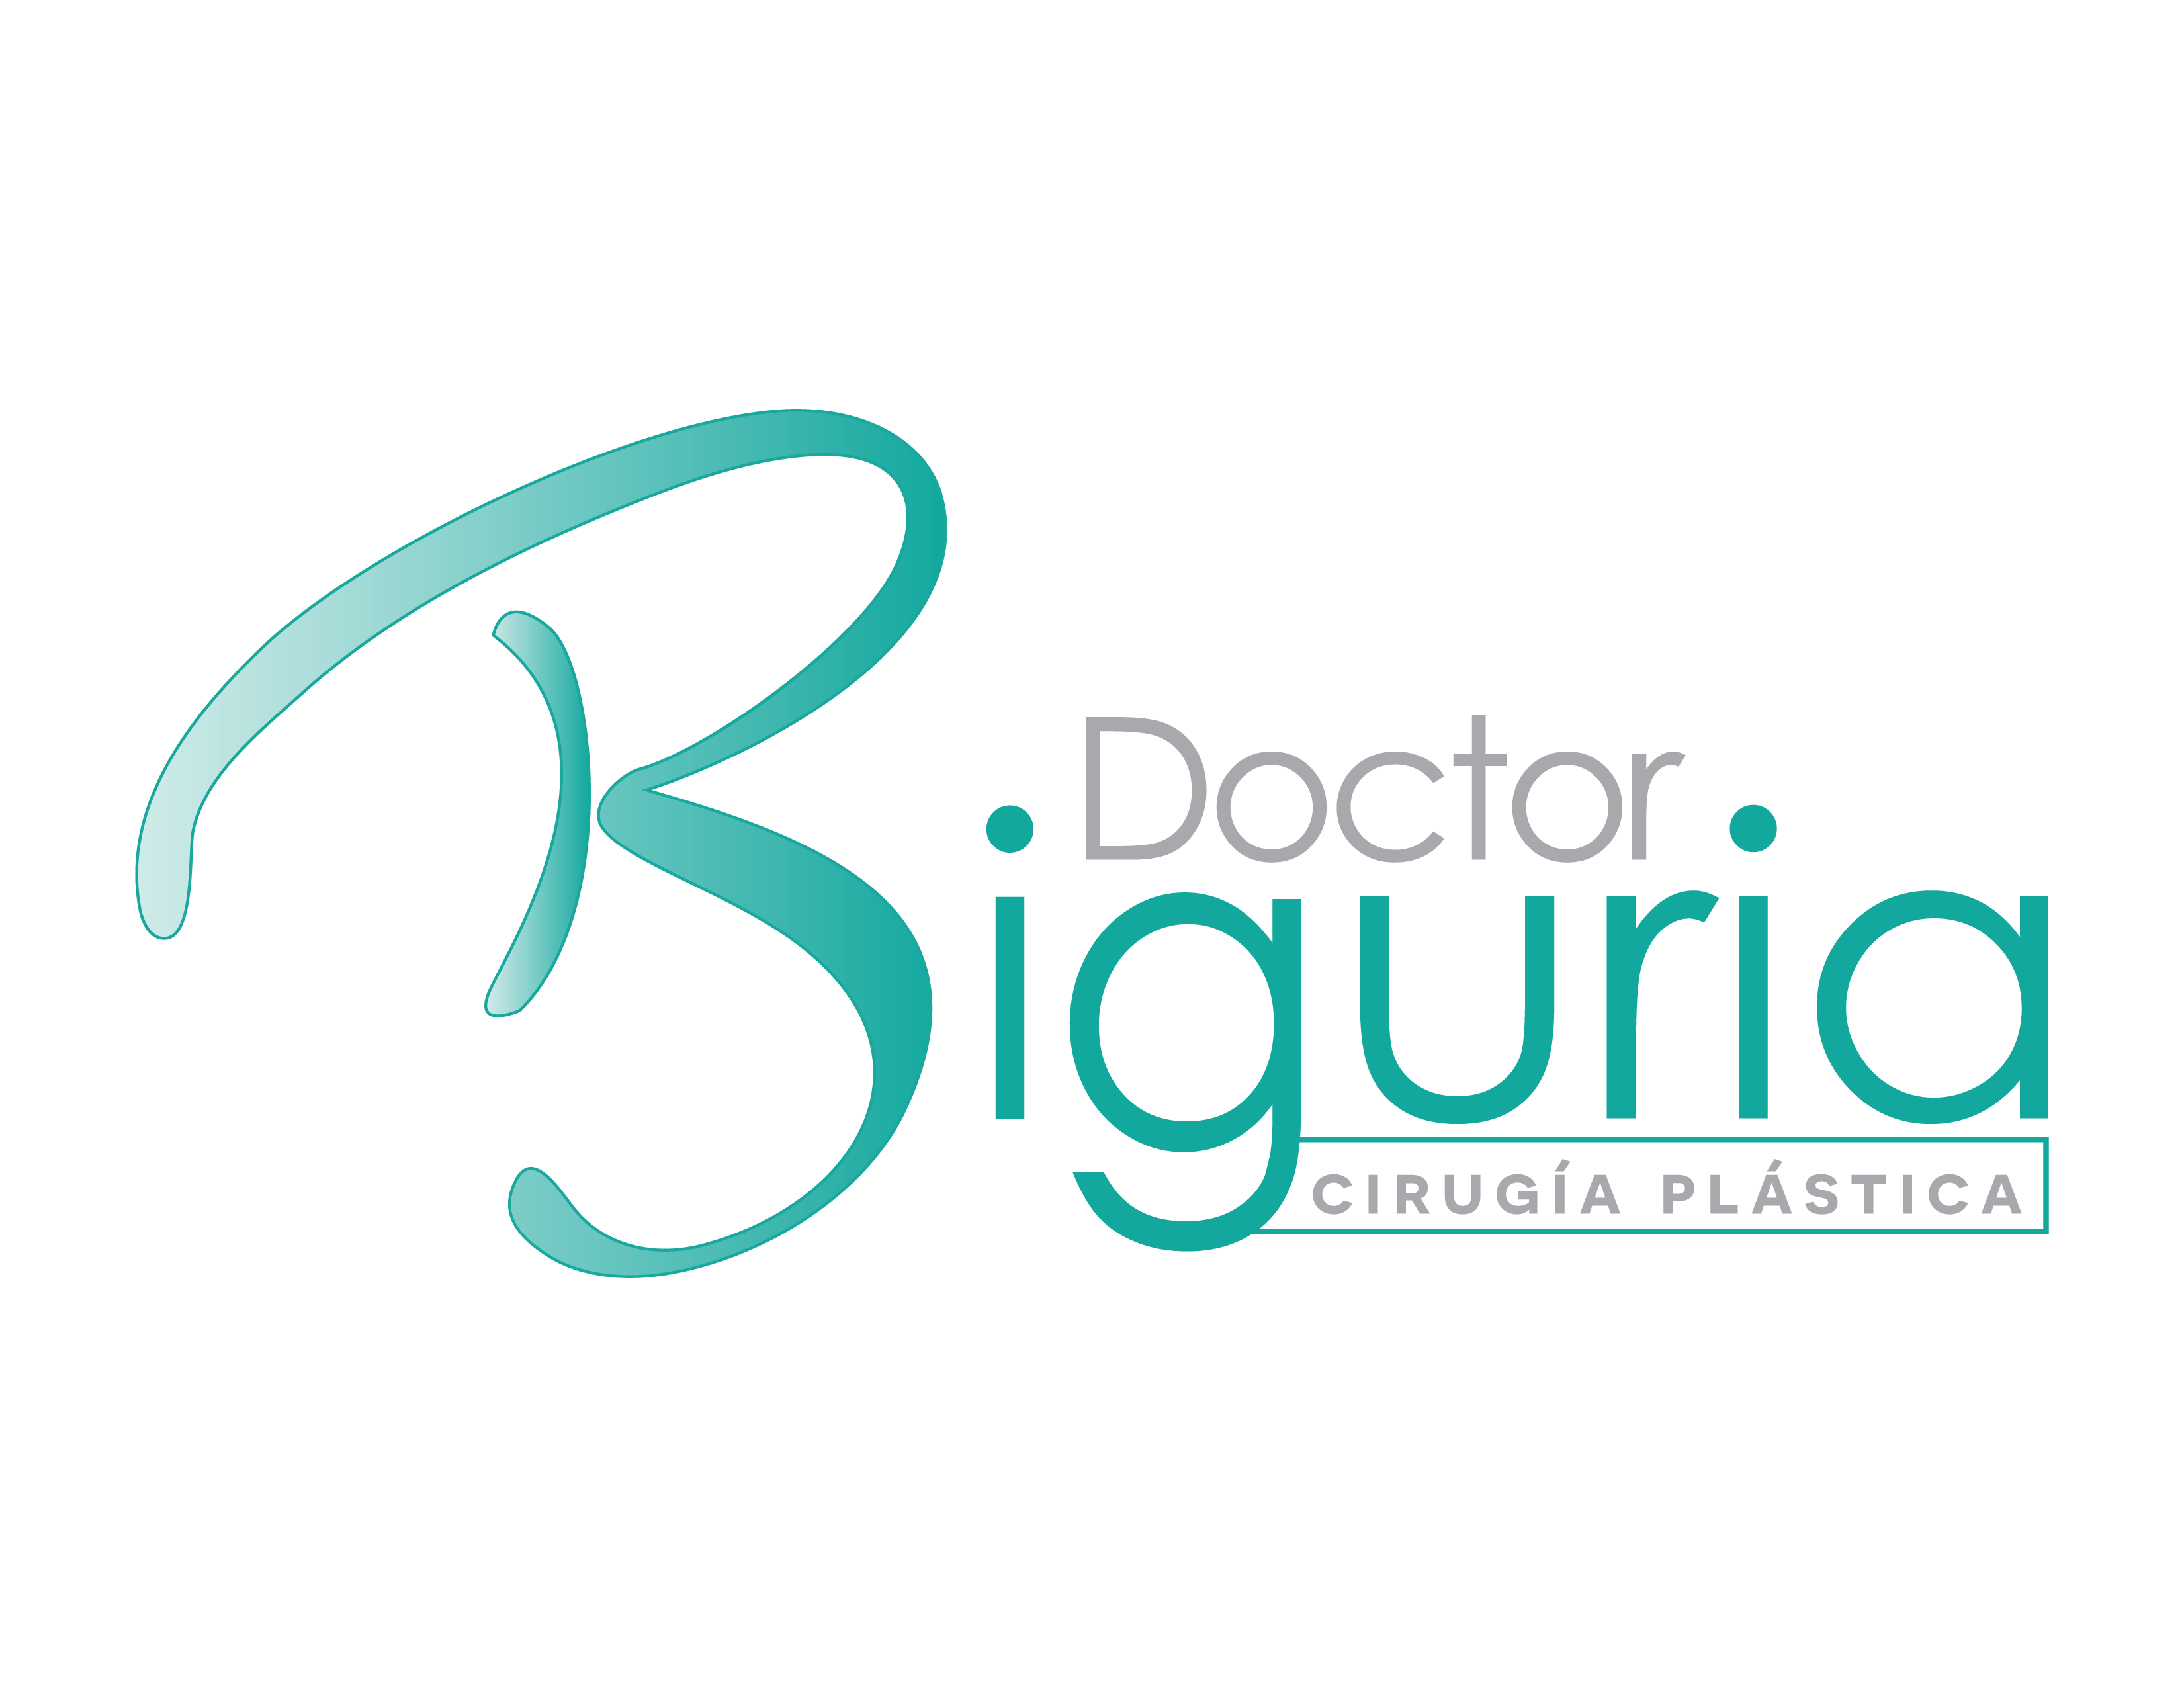 Doctor Biguria